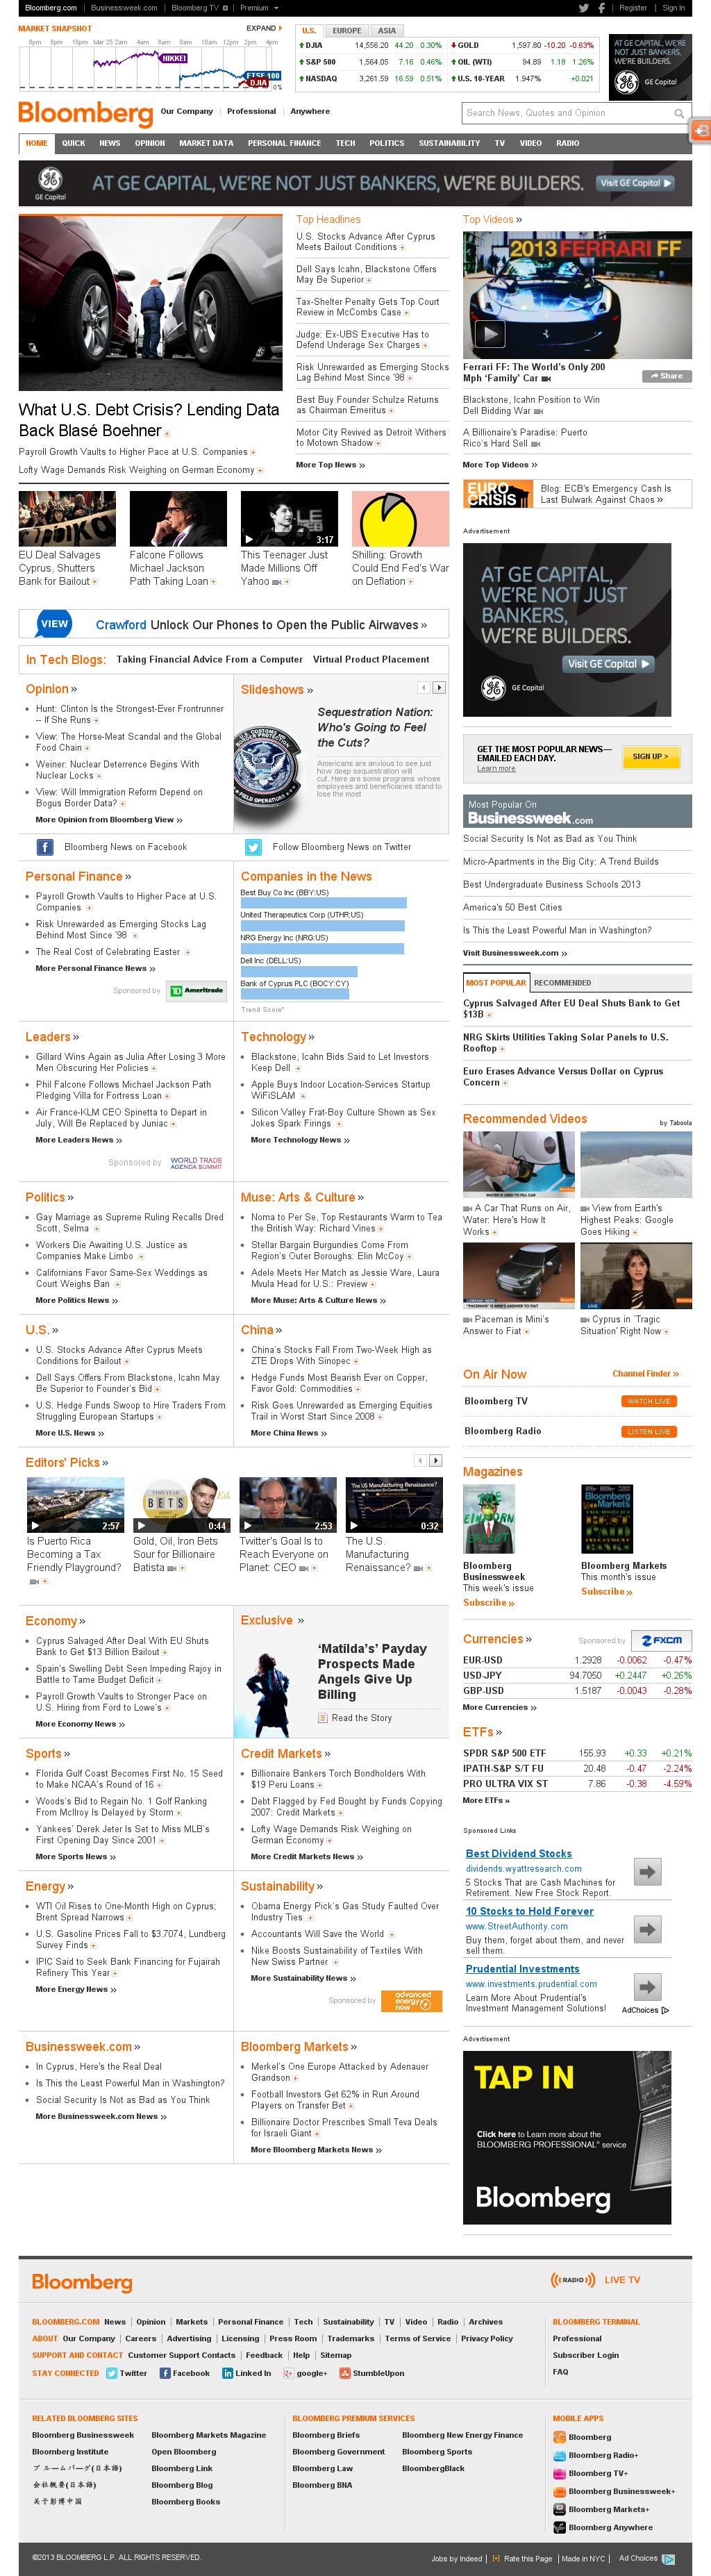 Bloomberg at Monday March 25, 2013, 2:10 p.m. UTC